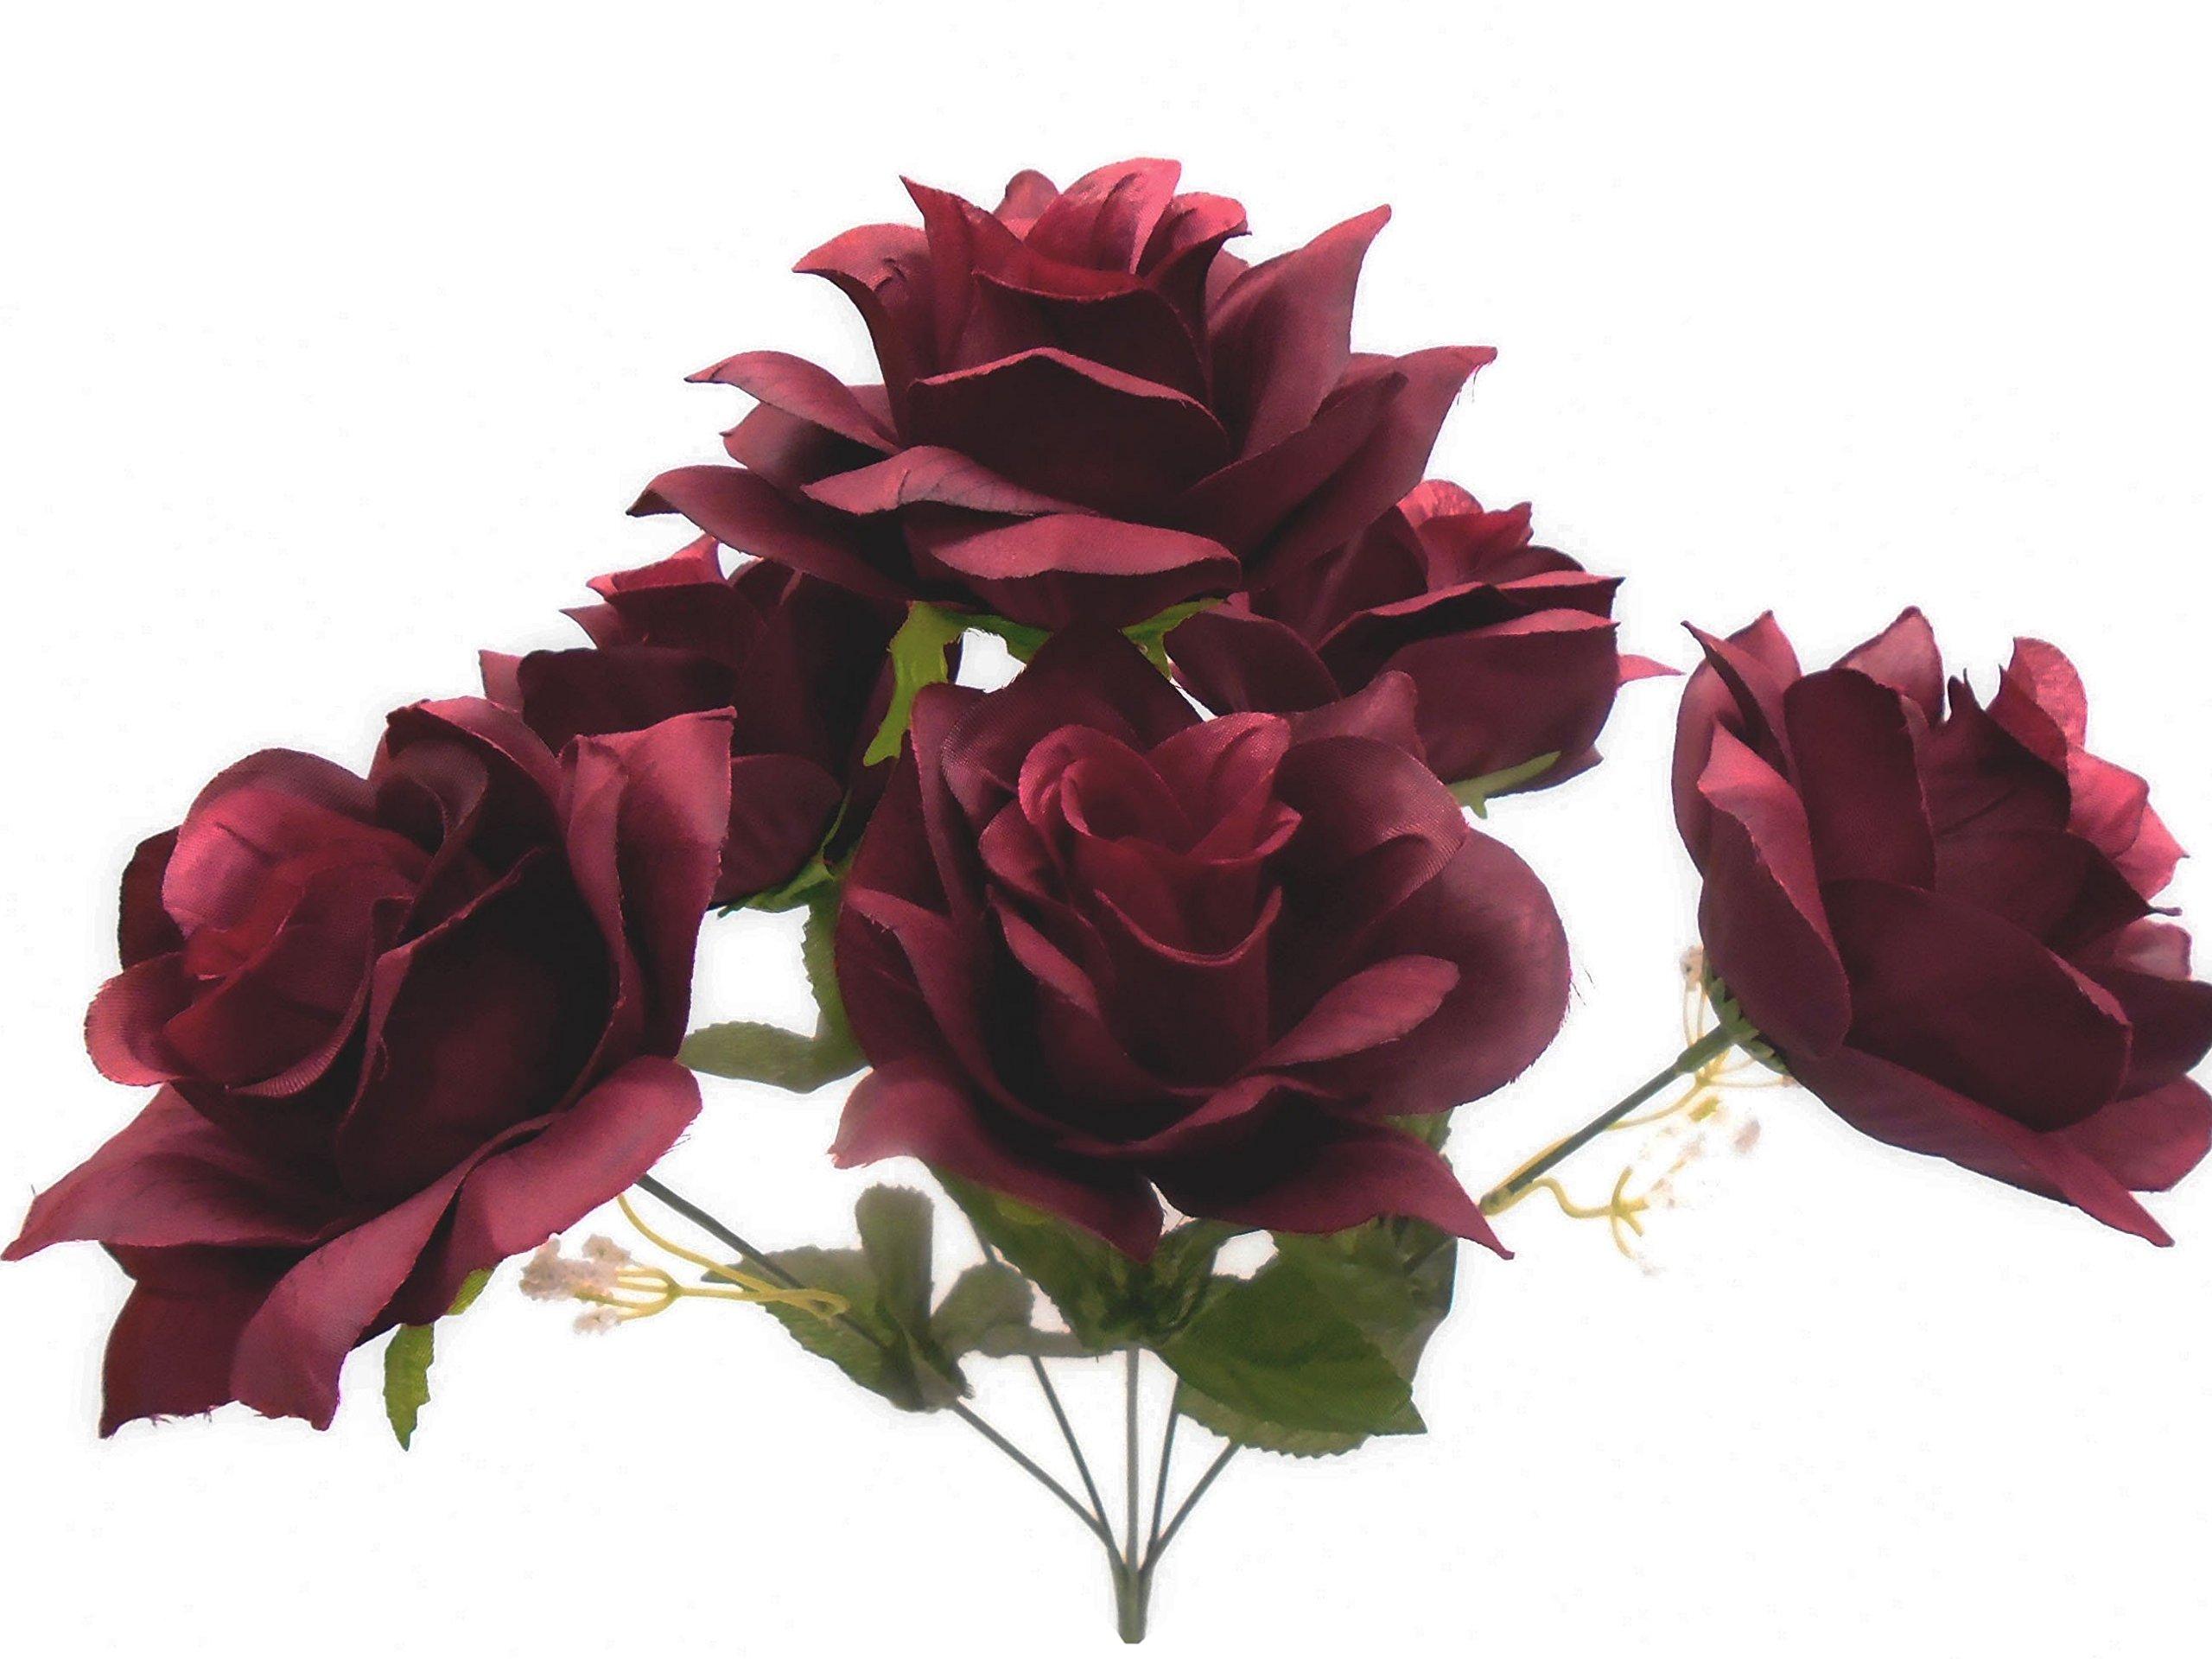 2-Bushes-Open-Rose-Artificial-Silk-Flowers-Bouquet-6-7203-Burgundy